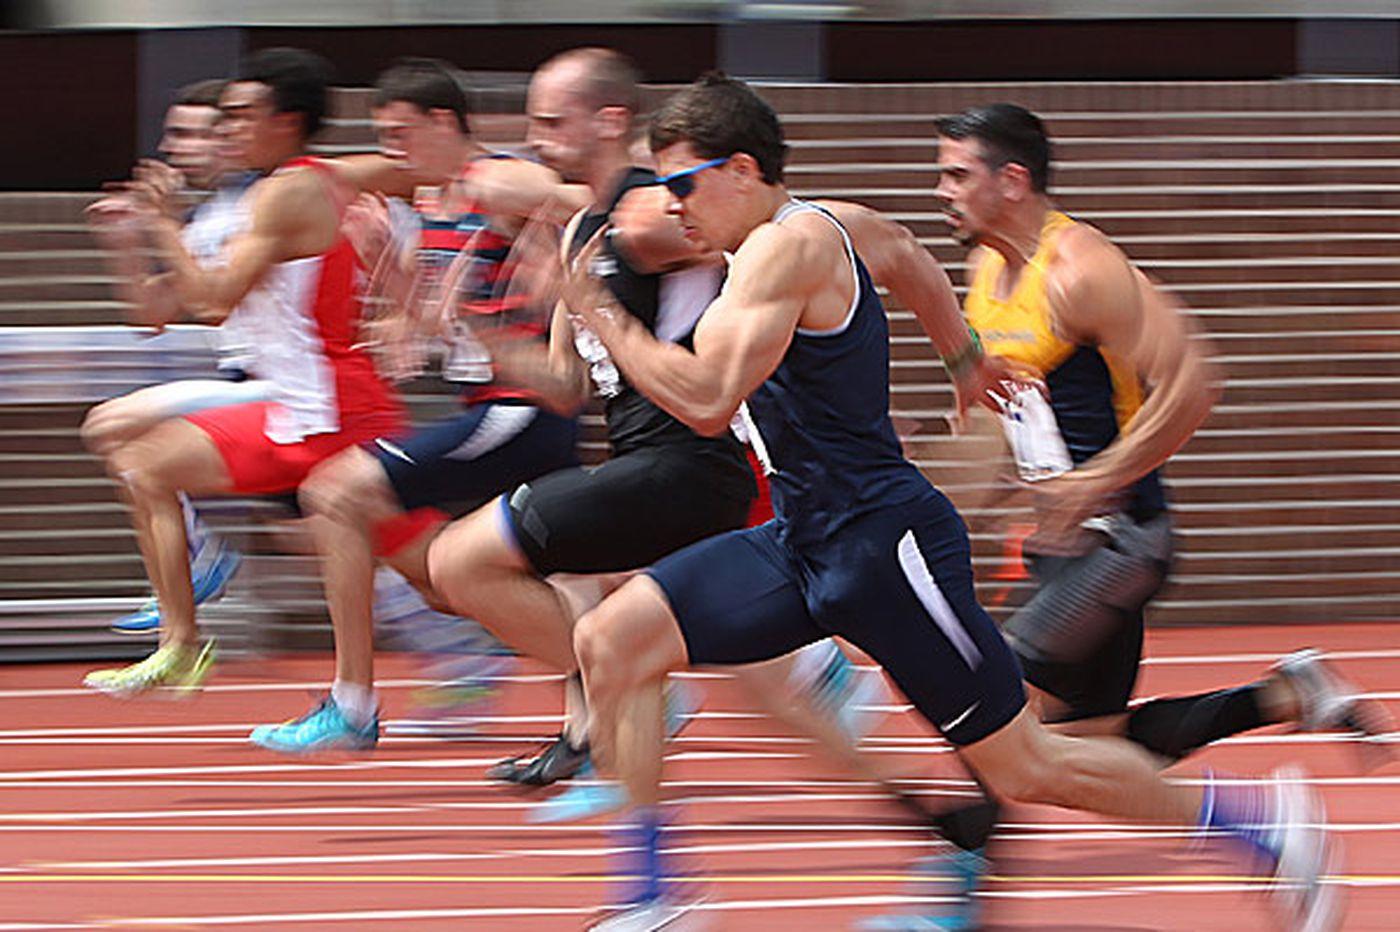 Penn's Pitt takes lead in decathlon